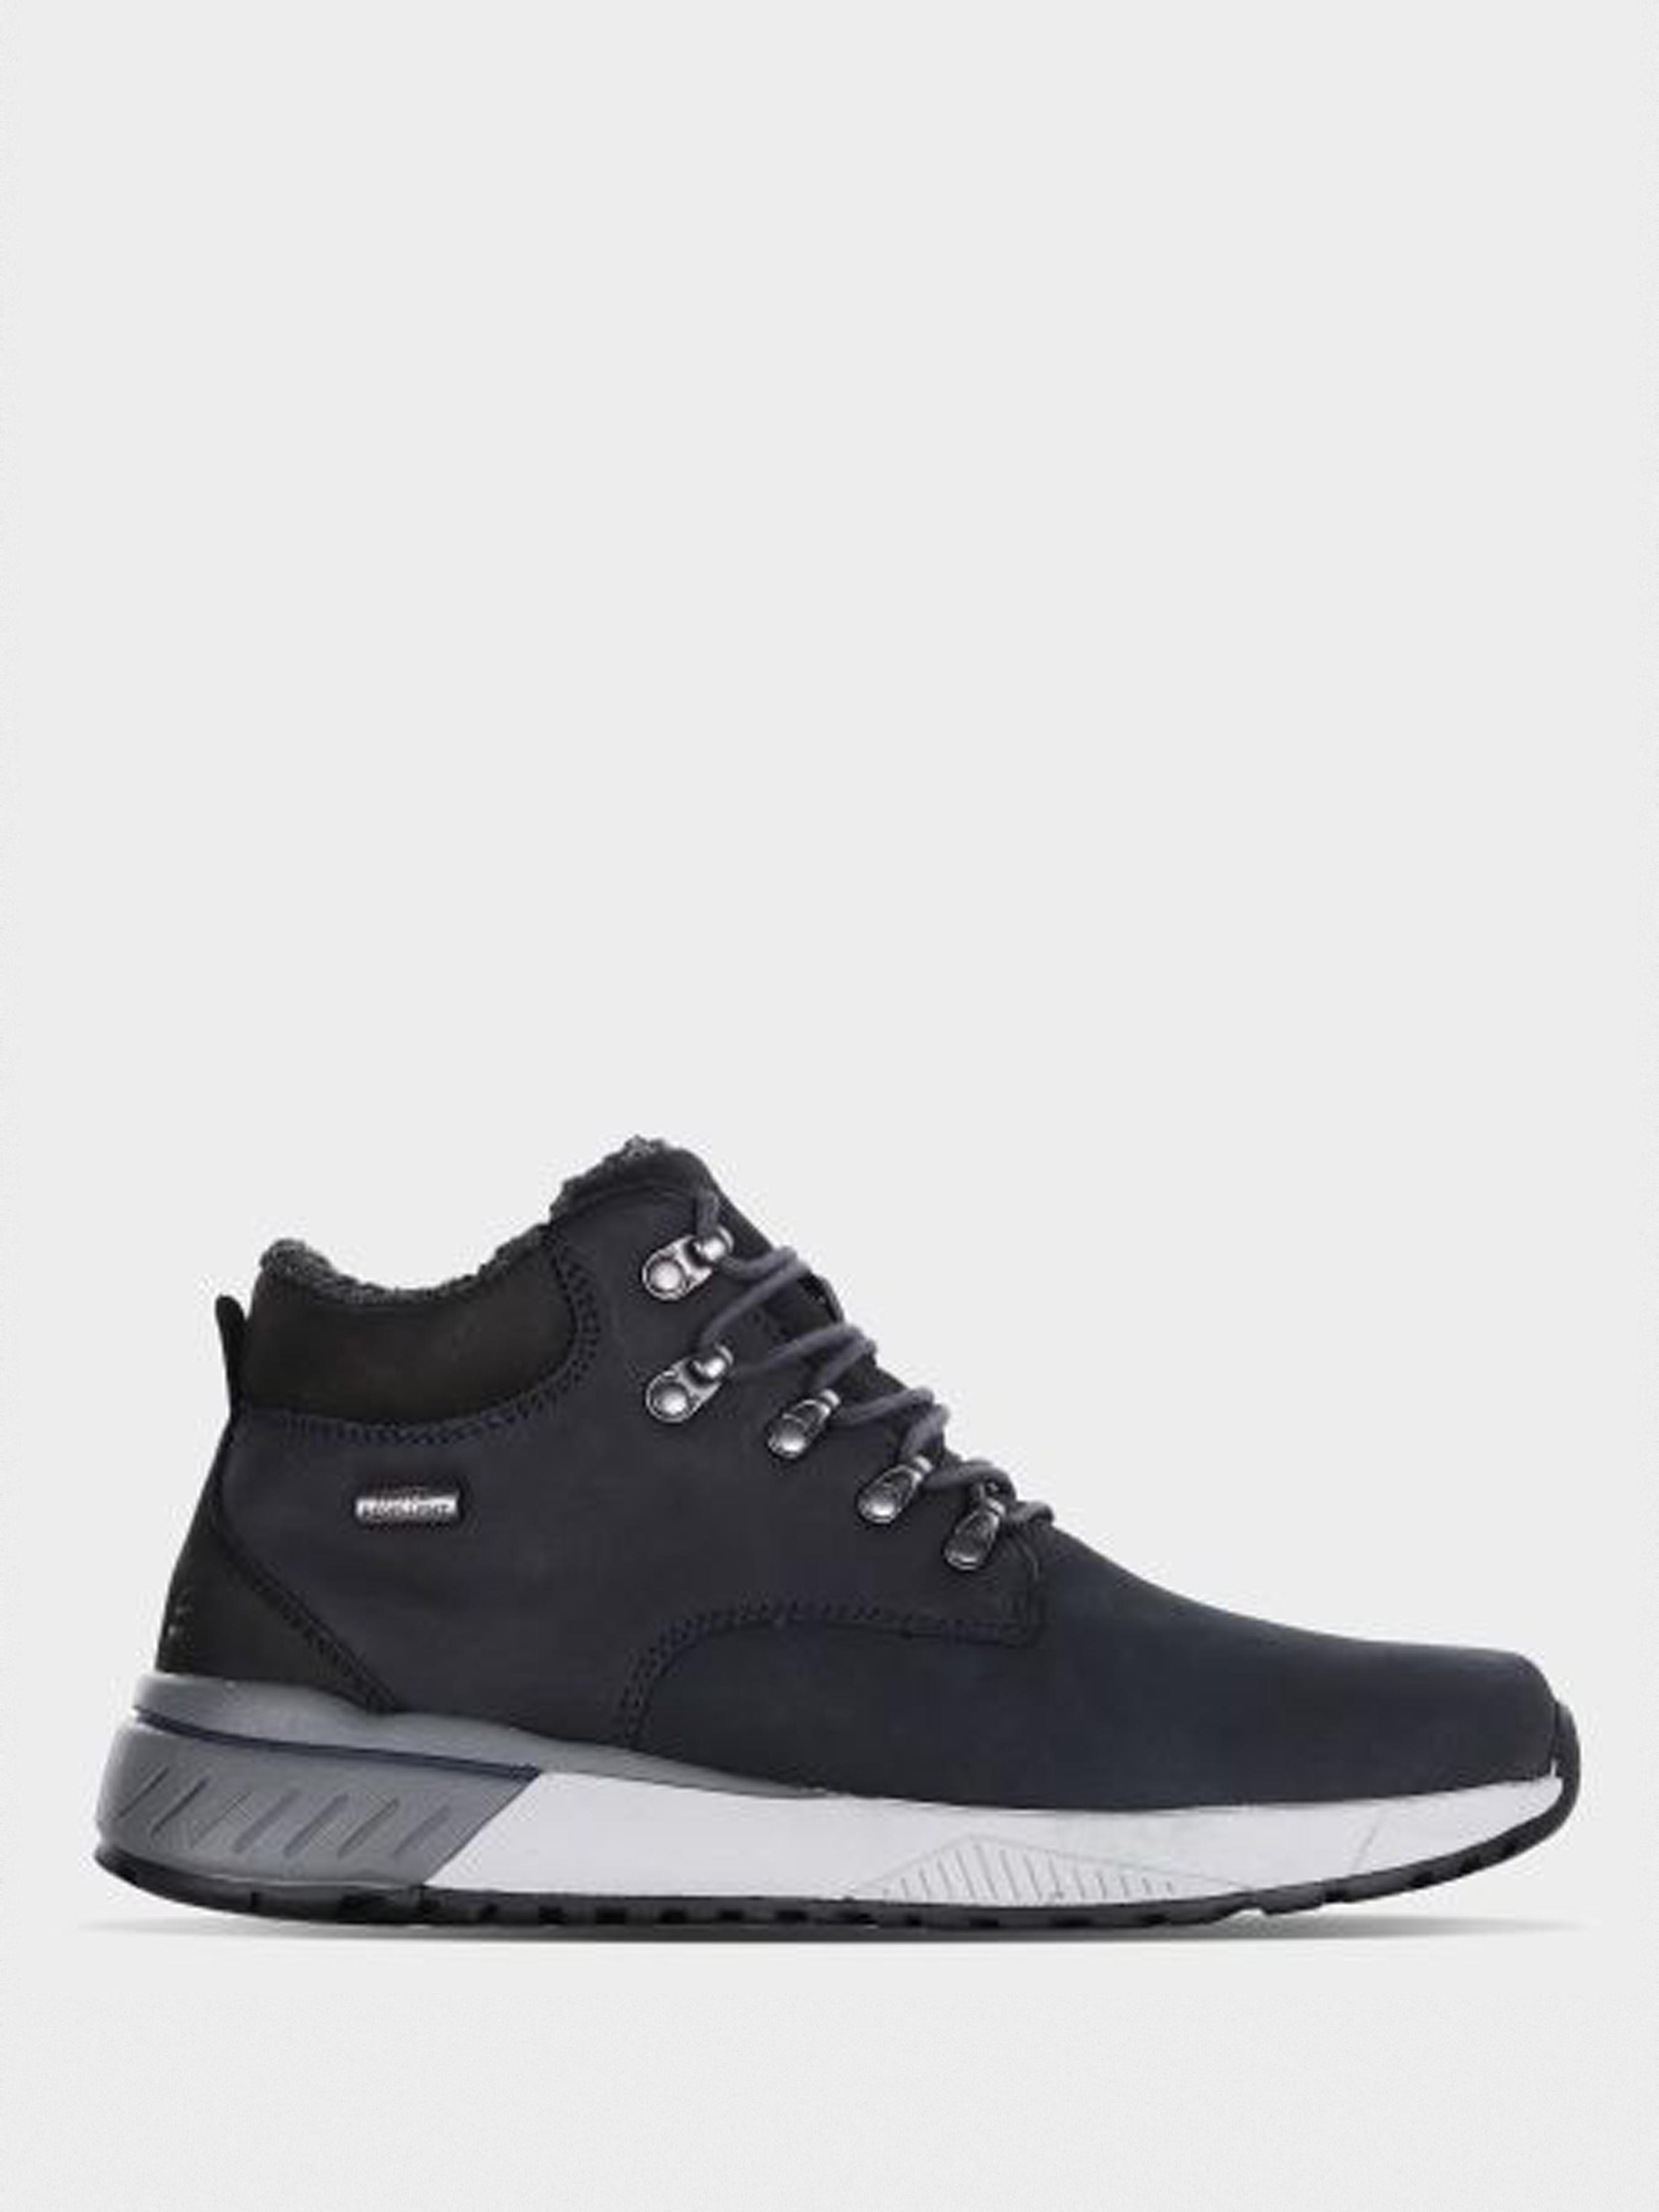 Купить Ботинки мужские Skechers KM3381, Синий